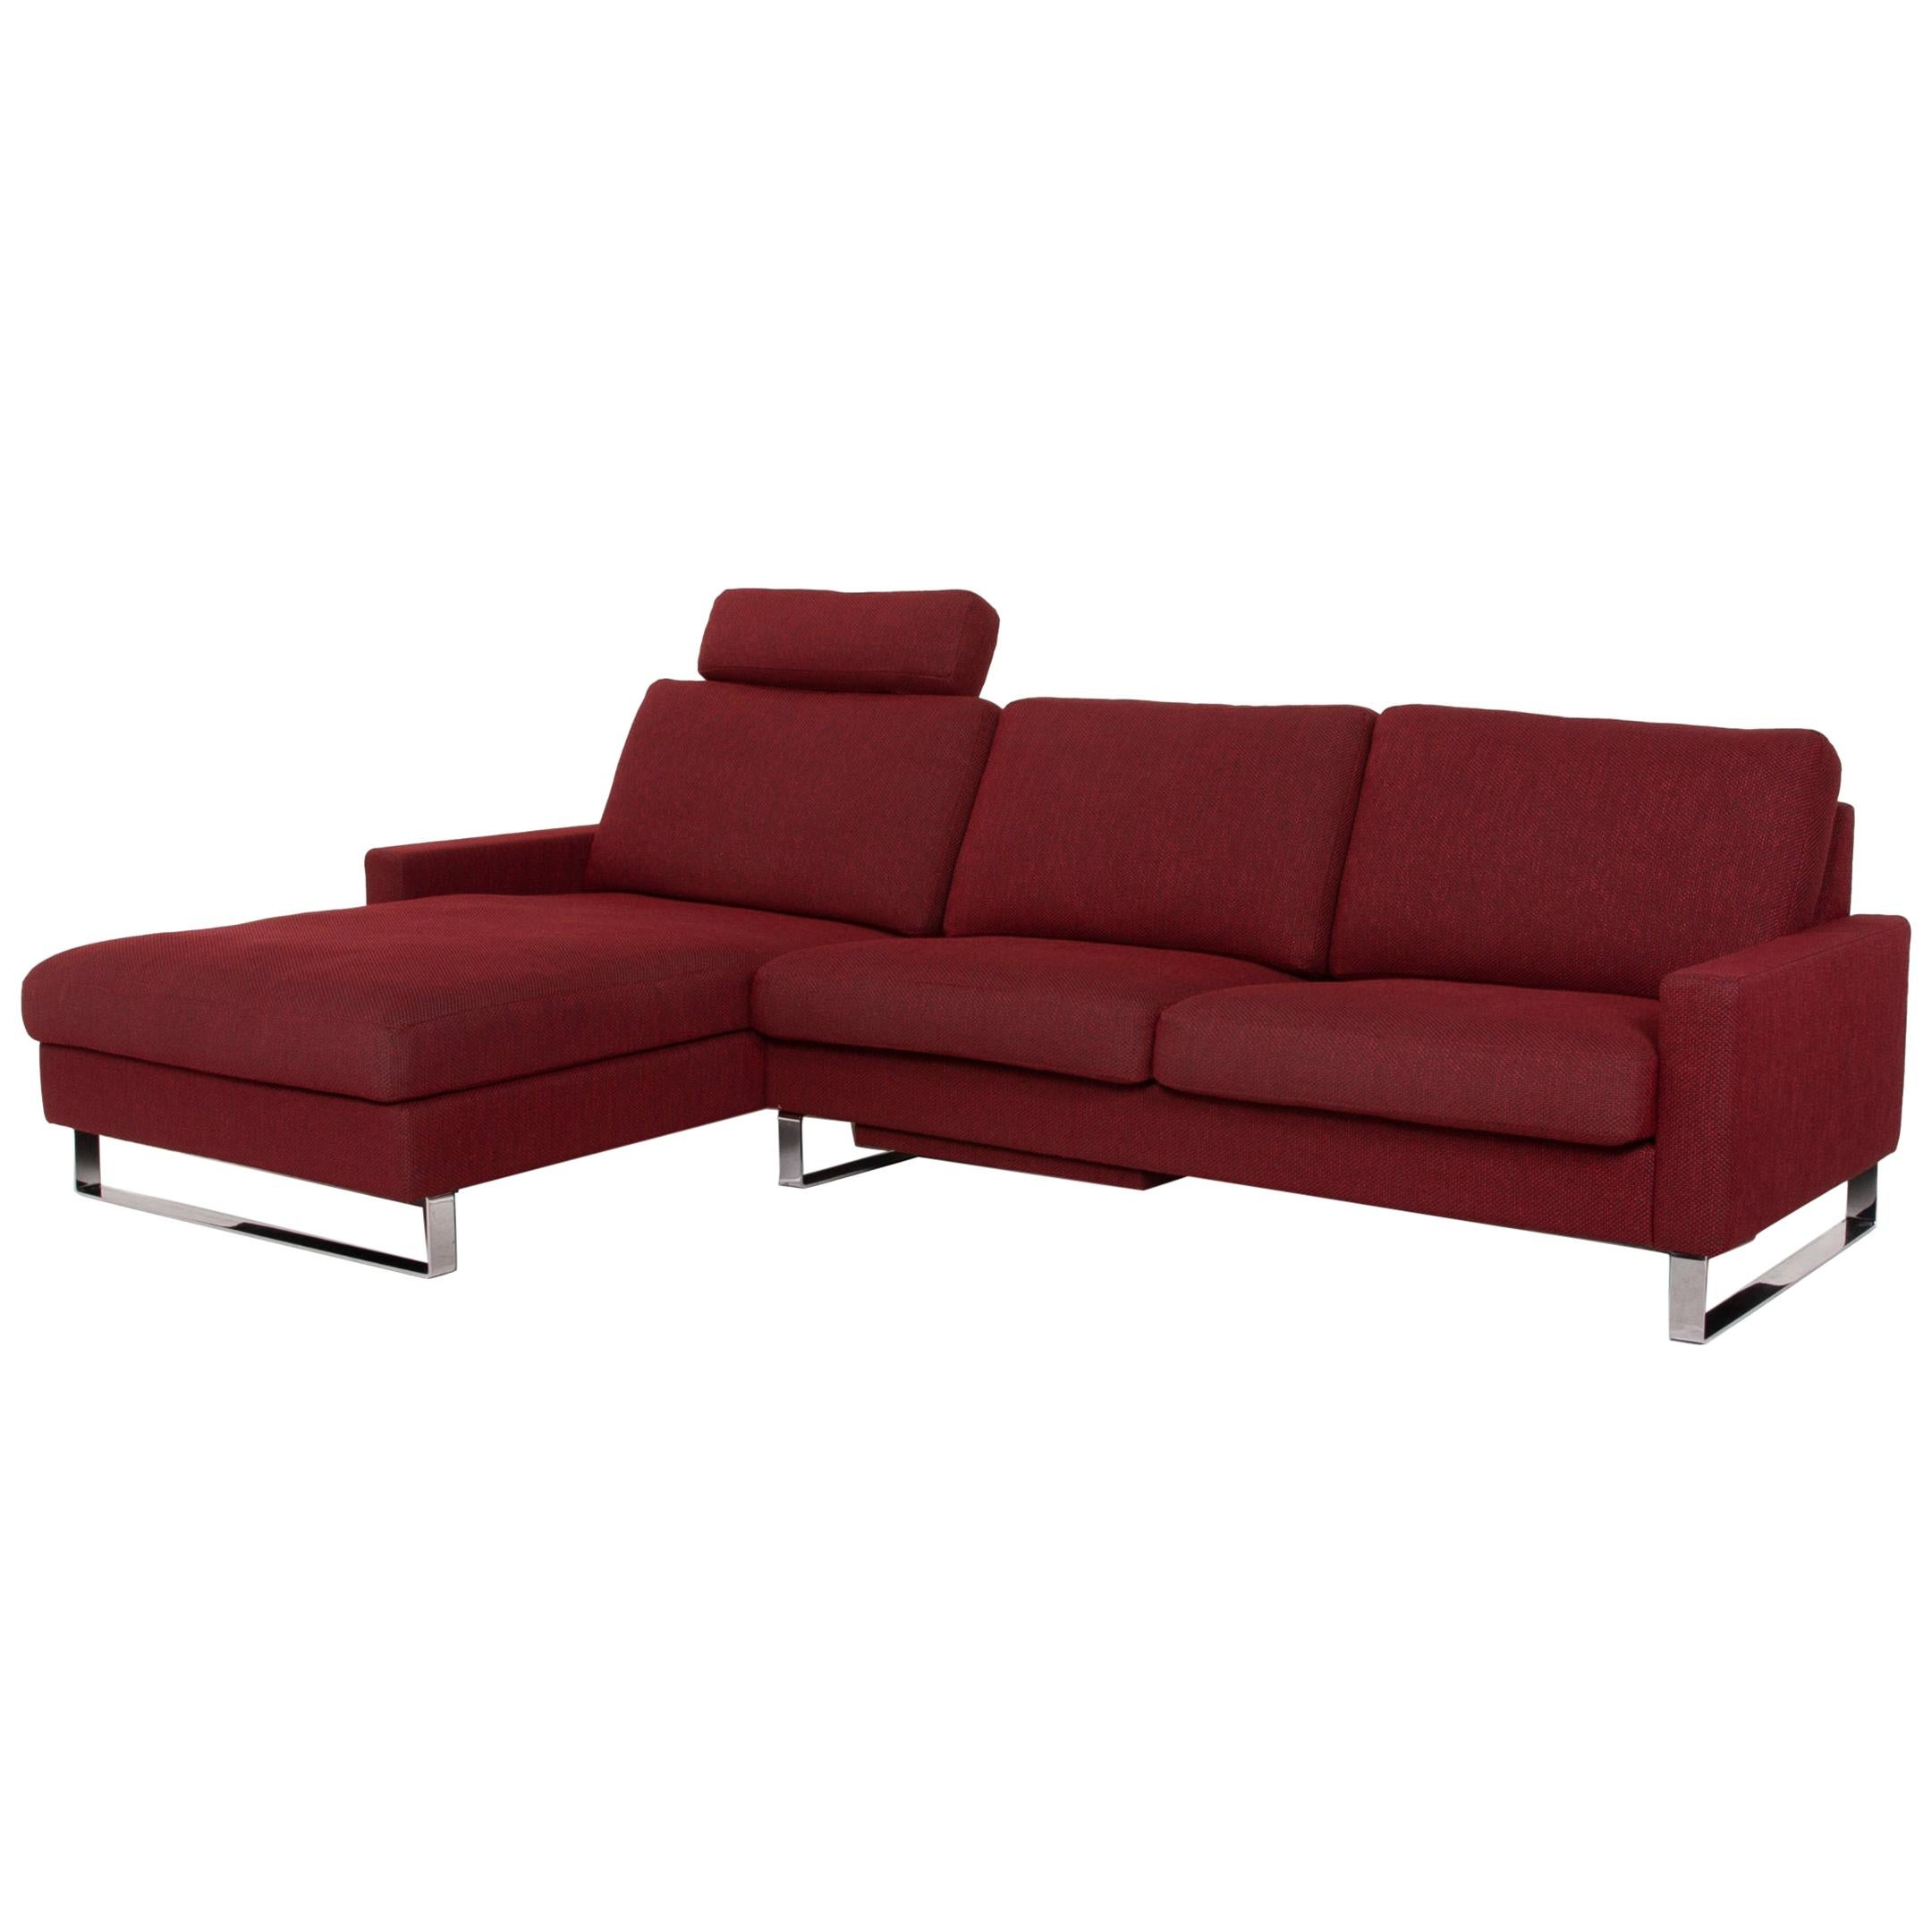 Erpo CL 500 Fabric Sofa Red Corner Sofa